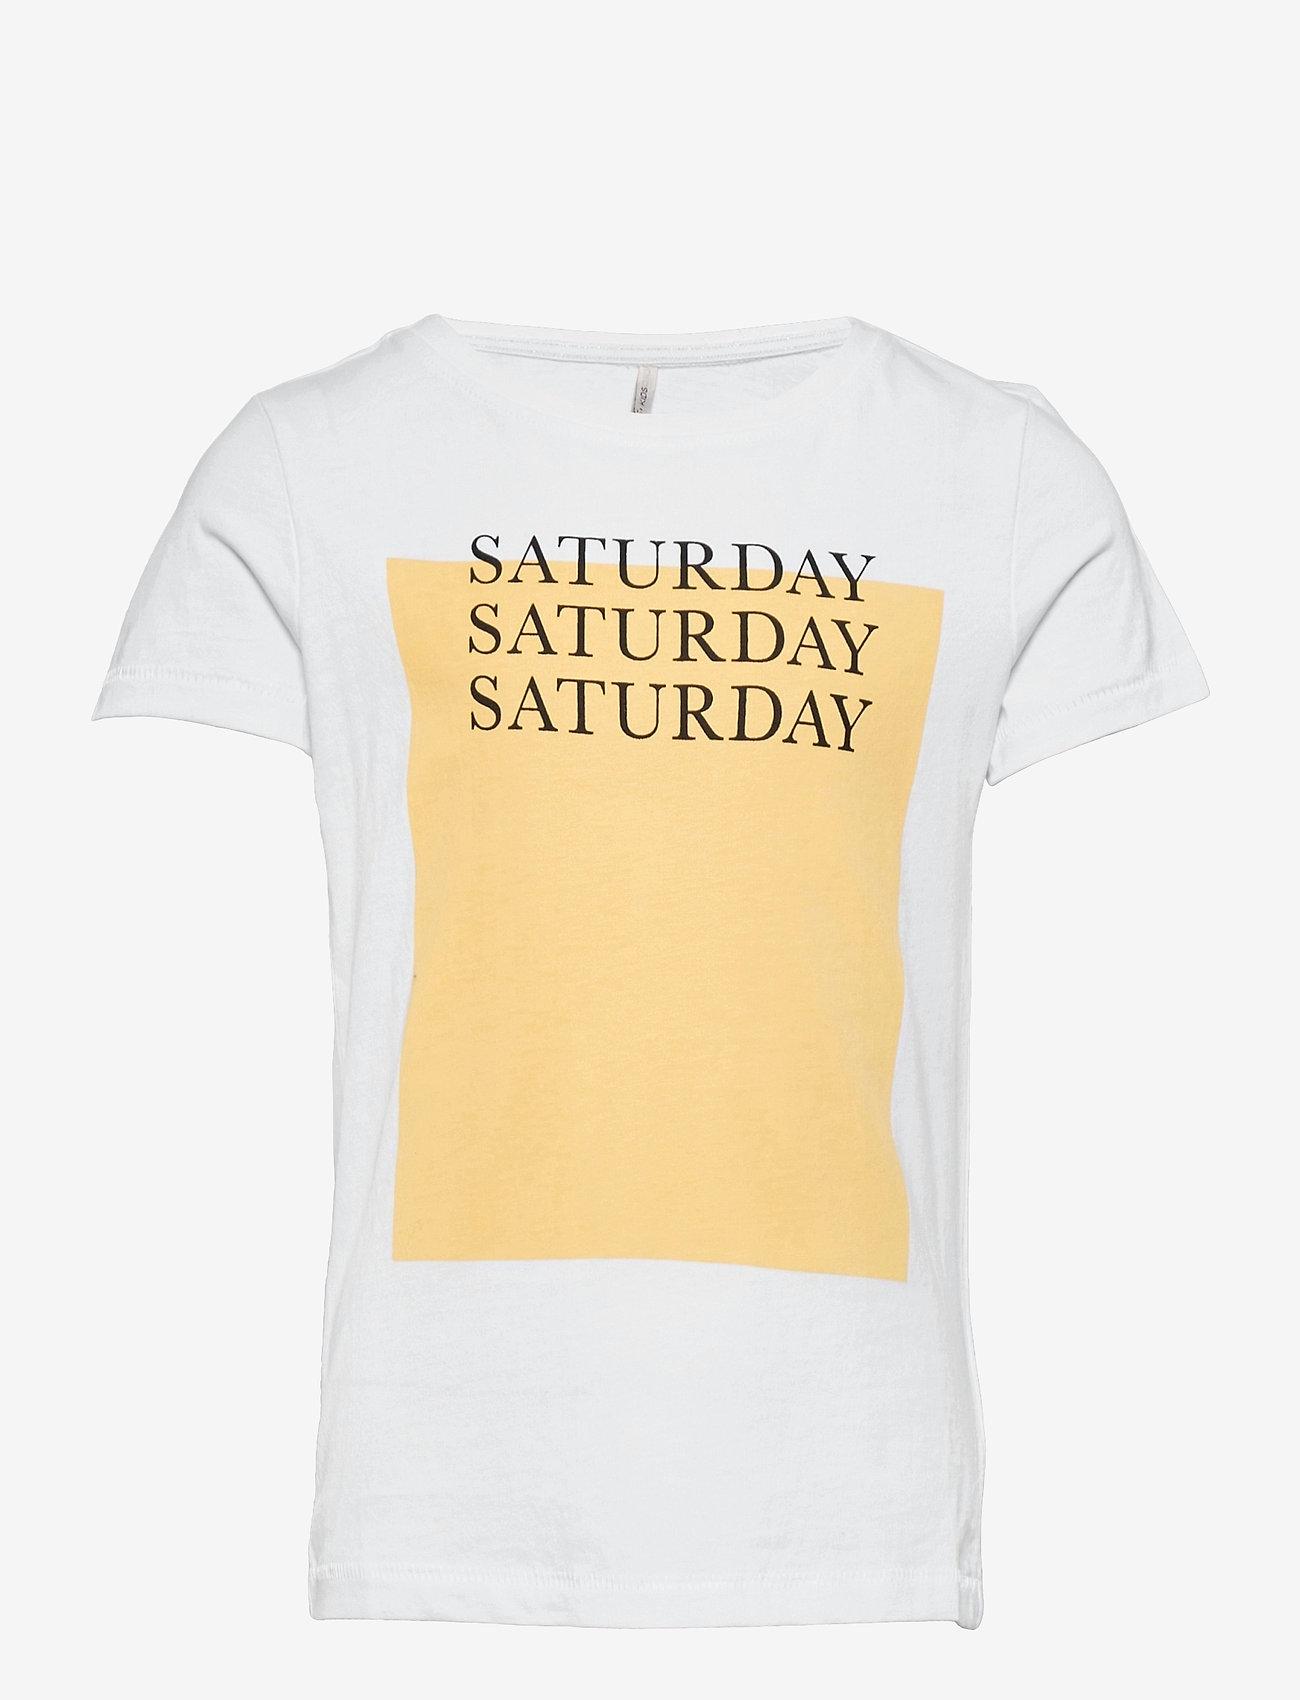 Kids Only - KONWEEKDAY LIFE REG S/S BOX TOP JRS - t-shirts - bright white - 0